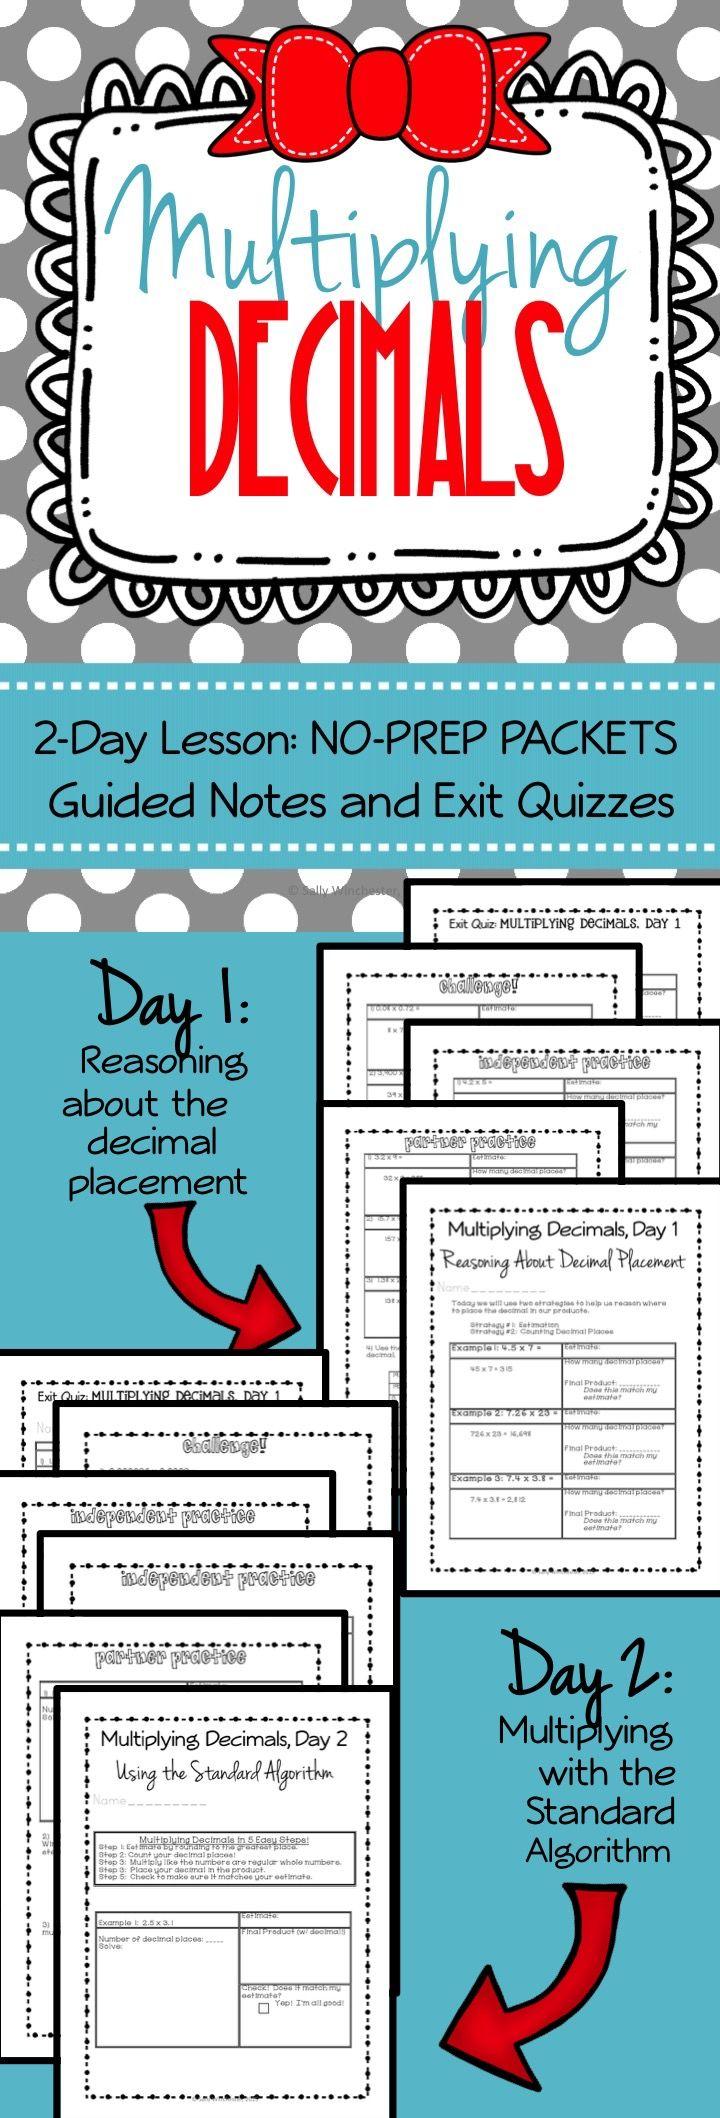 Multiplying Decimals 5 Nbt 7 Two Day Lesson No Prep